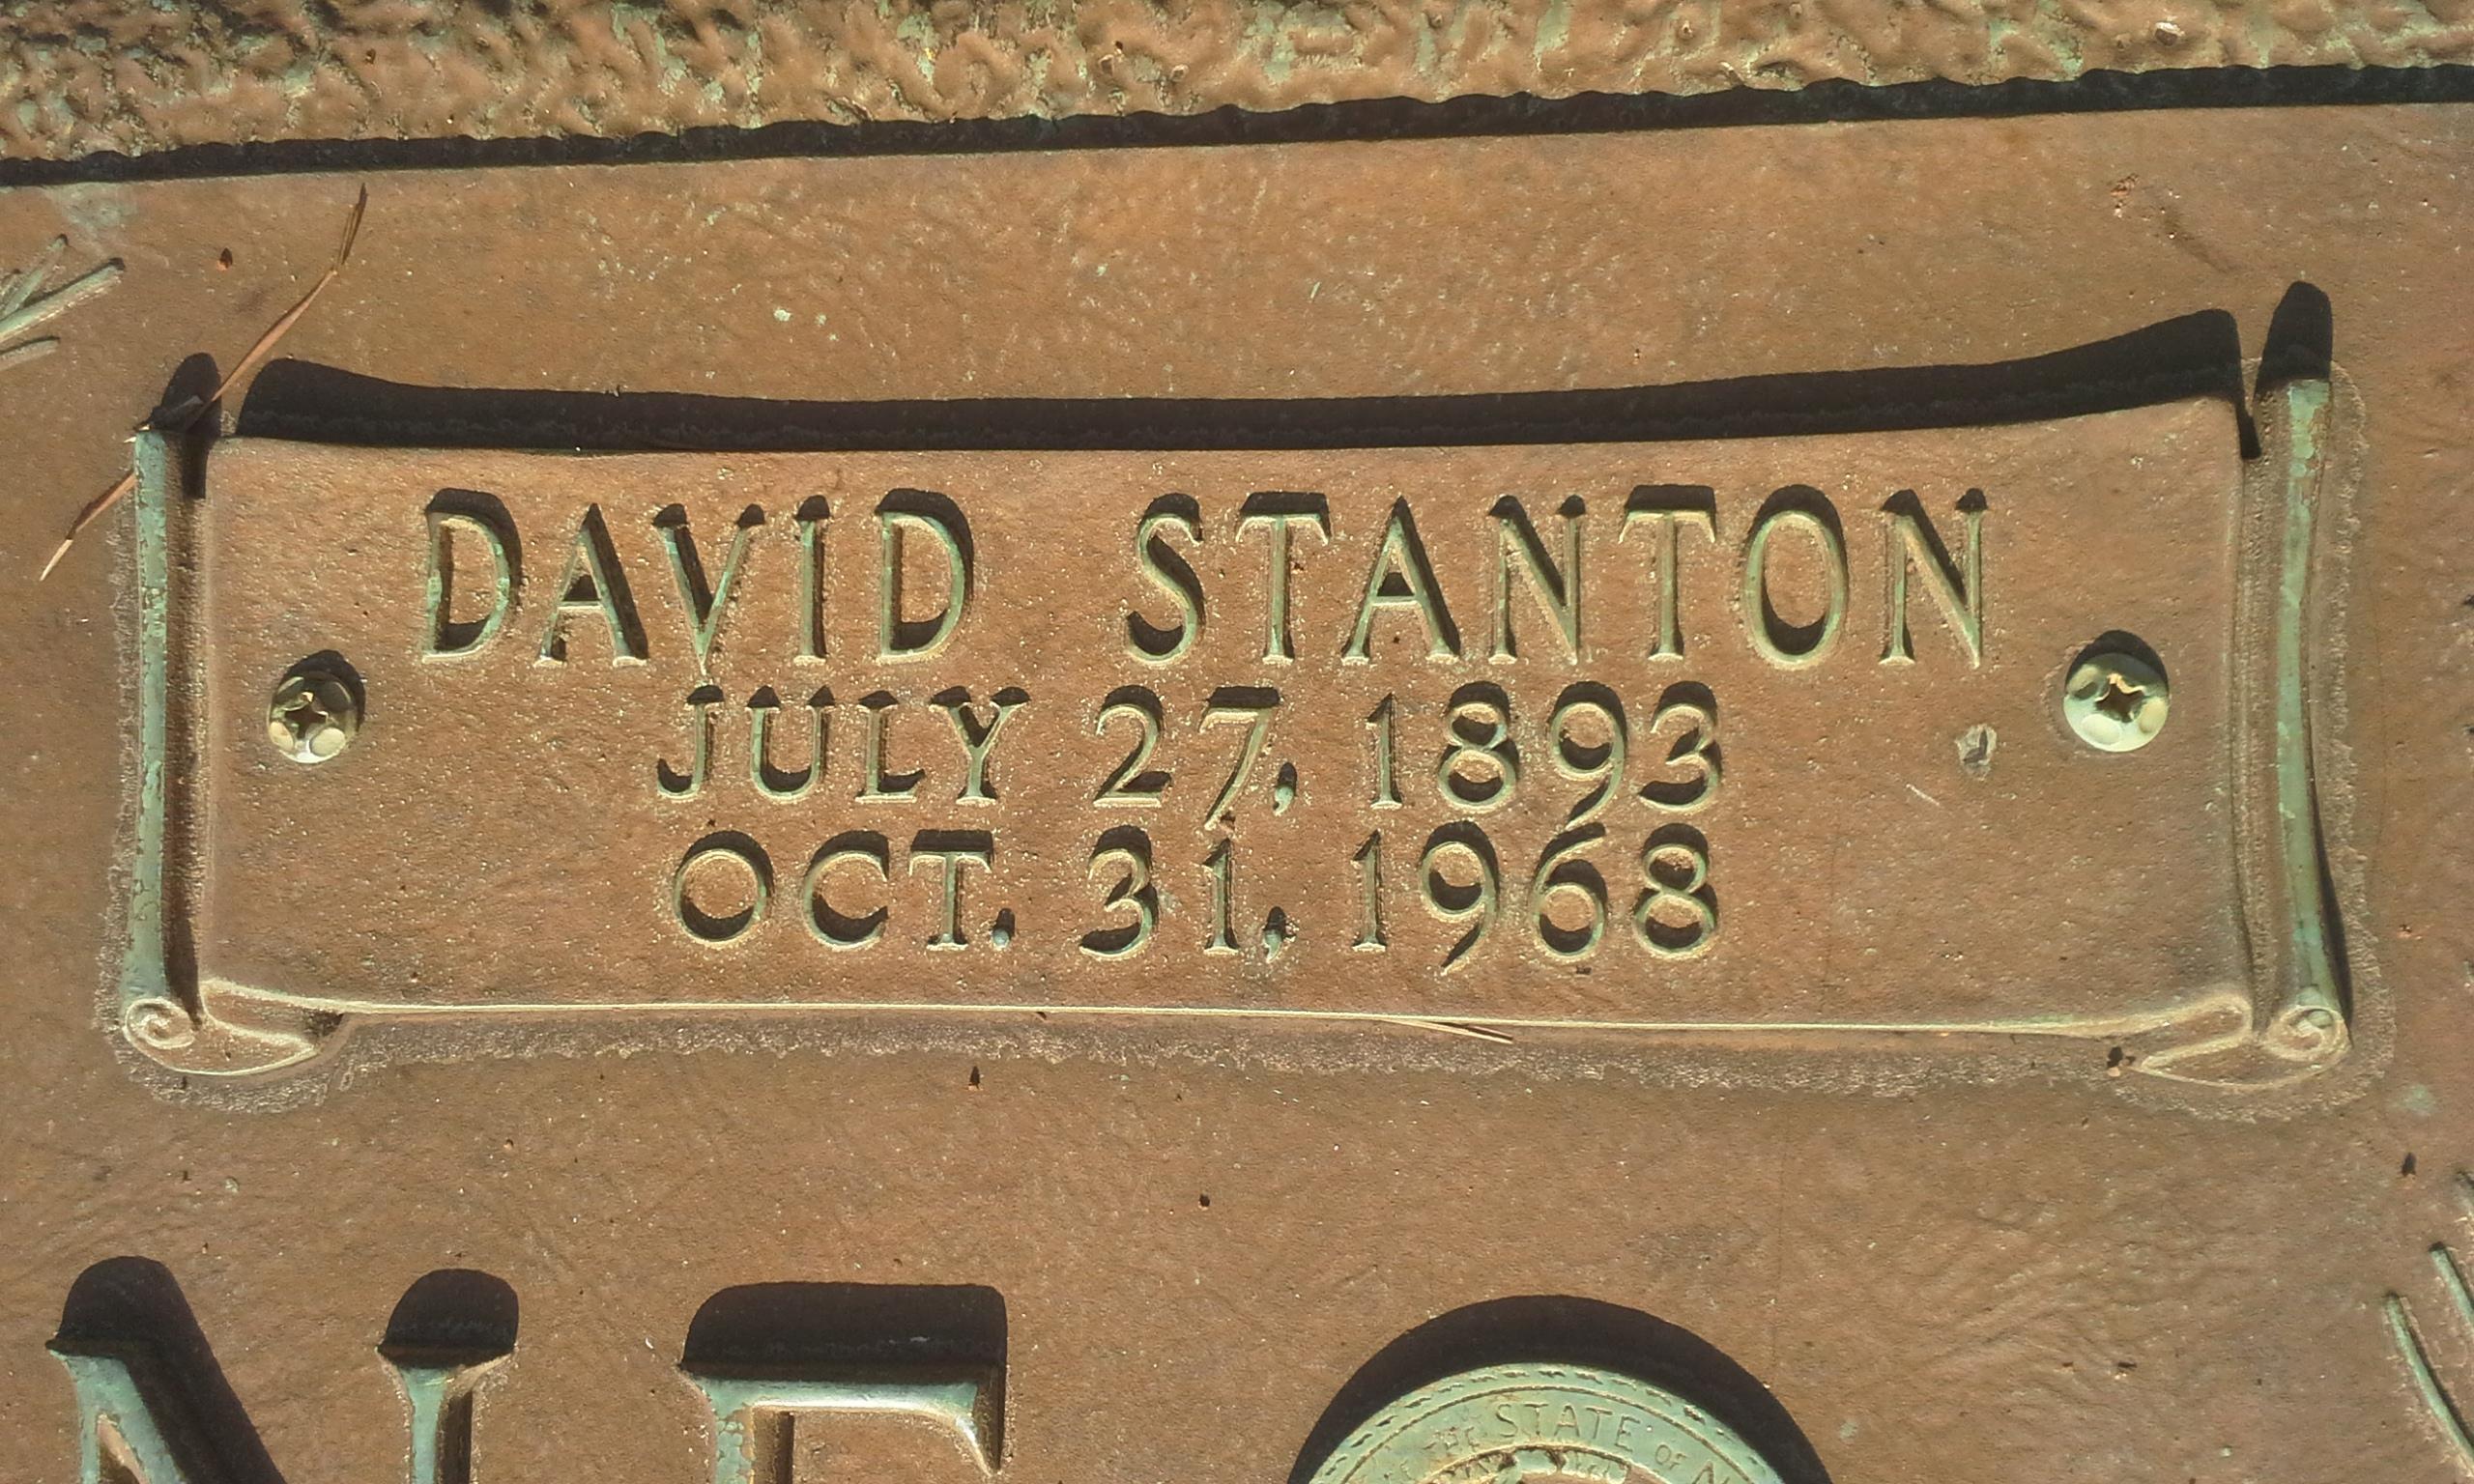 David Stanton Coltrane